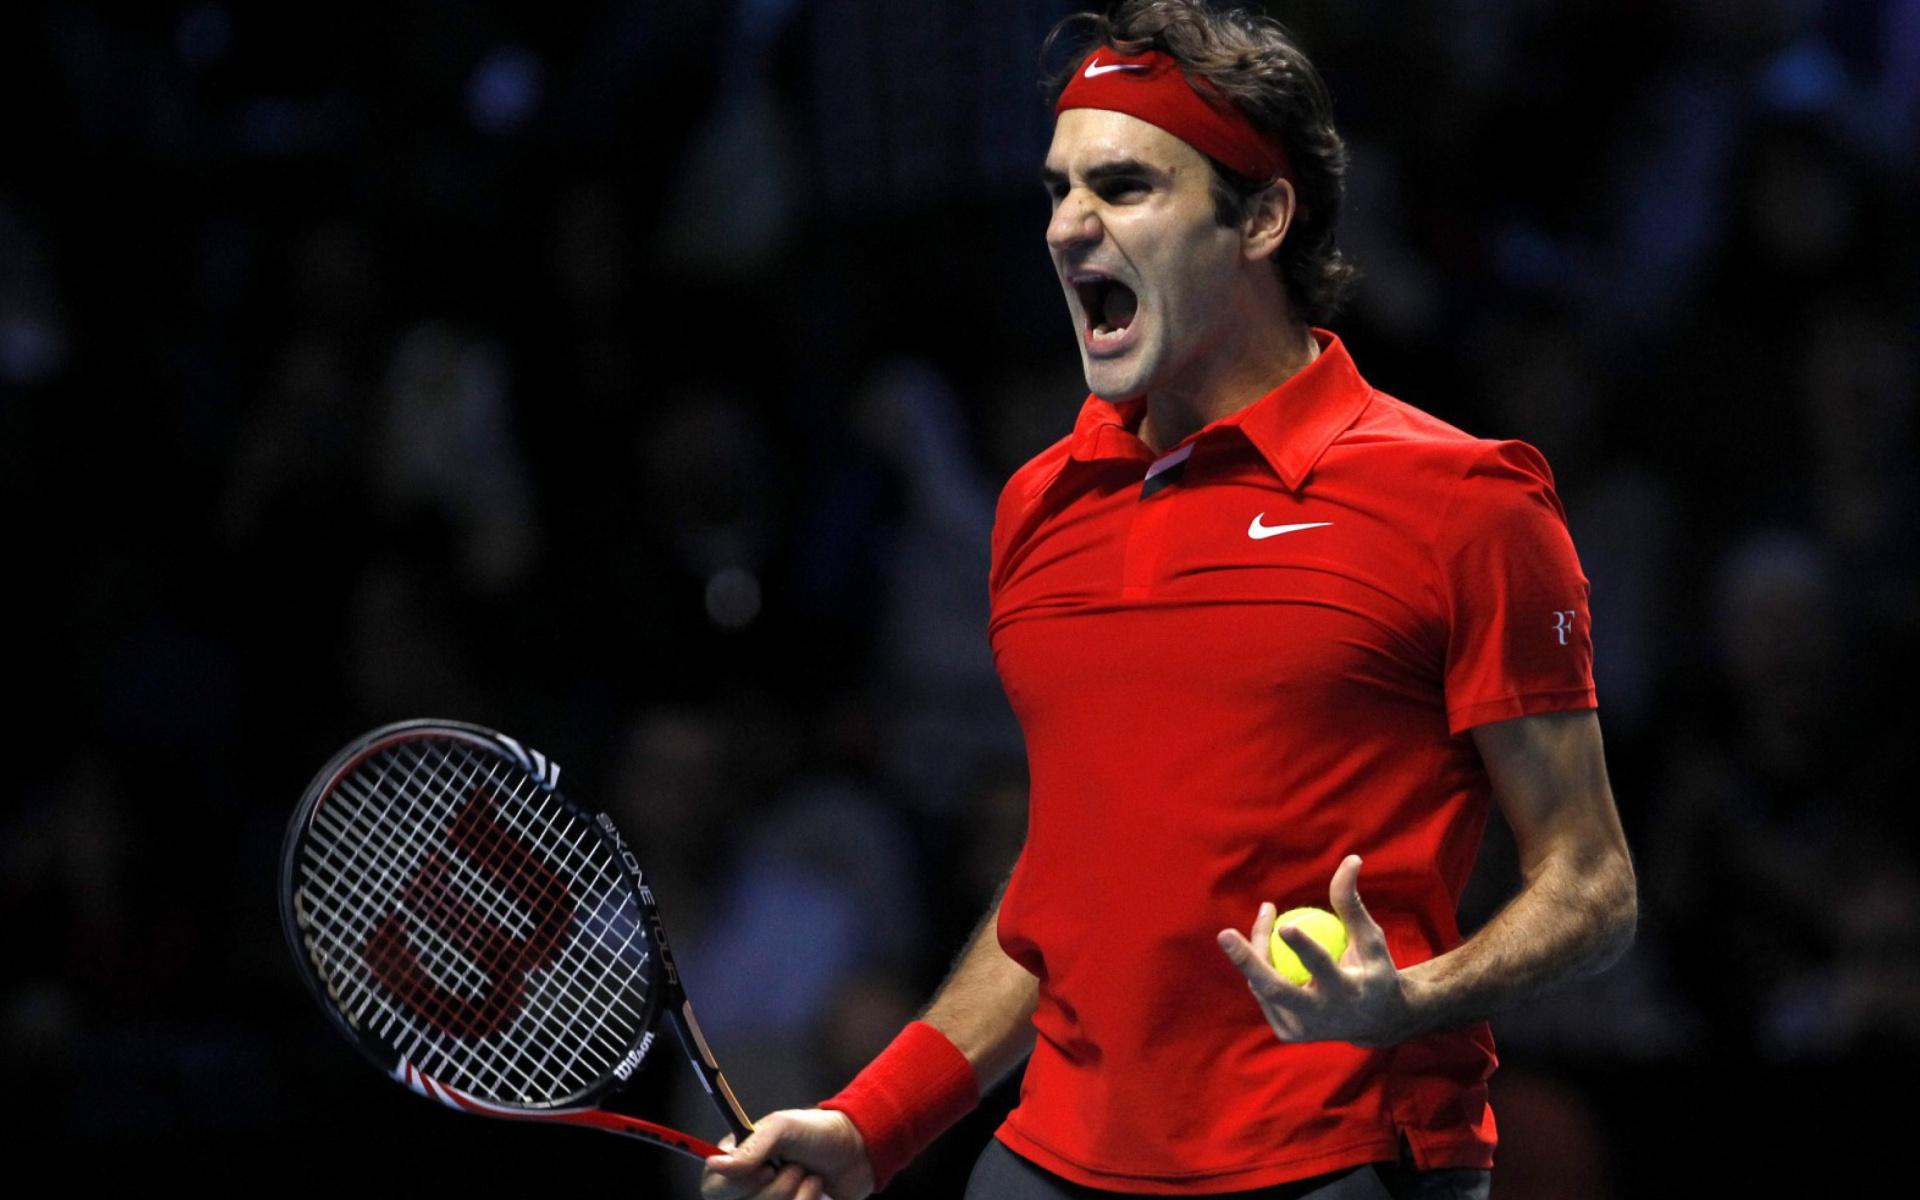 Roger Federer Wallpaper 1920x1200 Apps Directories 1920x1200